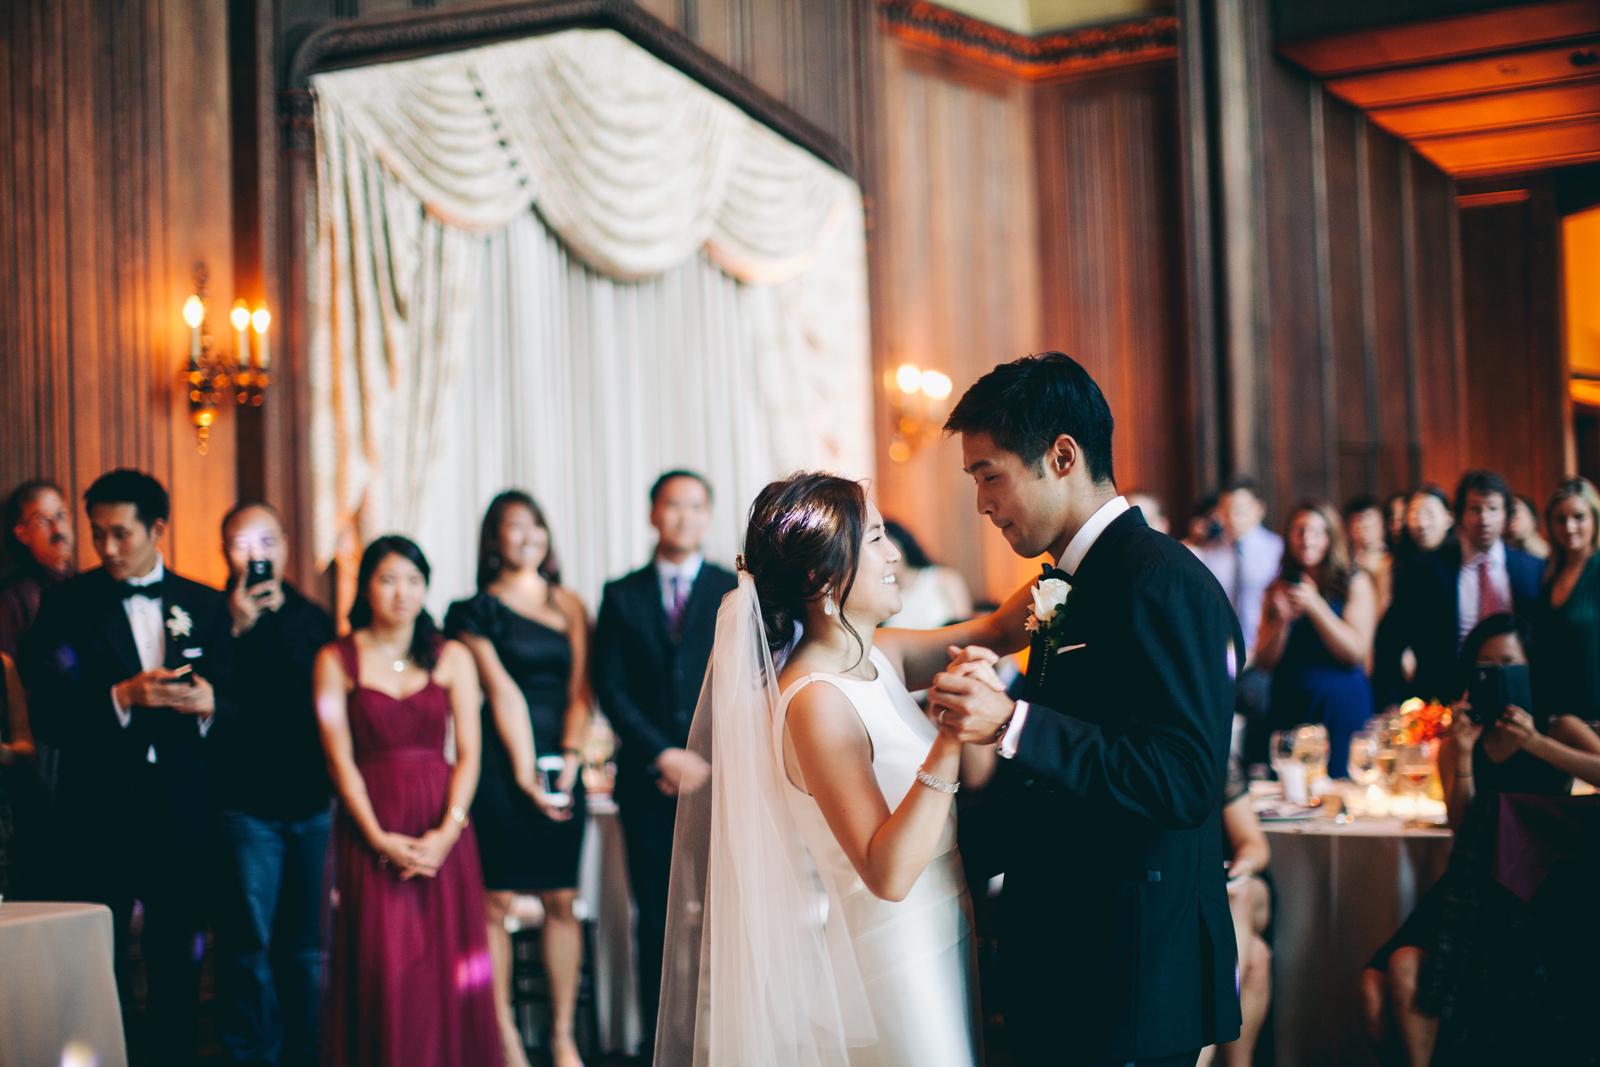 kohl_manison_wedding_photography_sarah_eric_ebony_siovhan_bokeh_photography_082.jpg